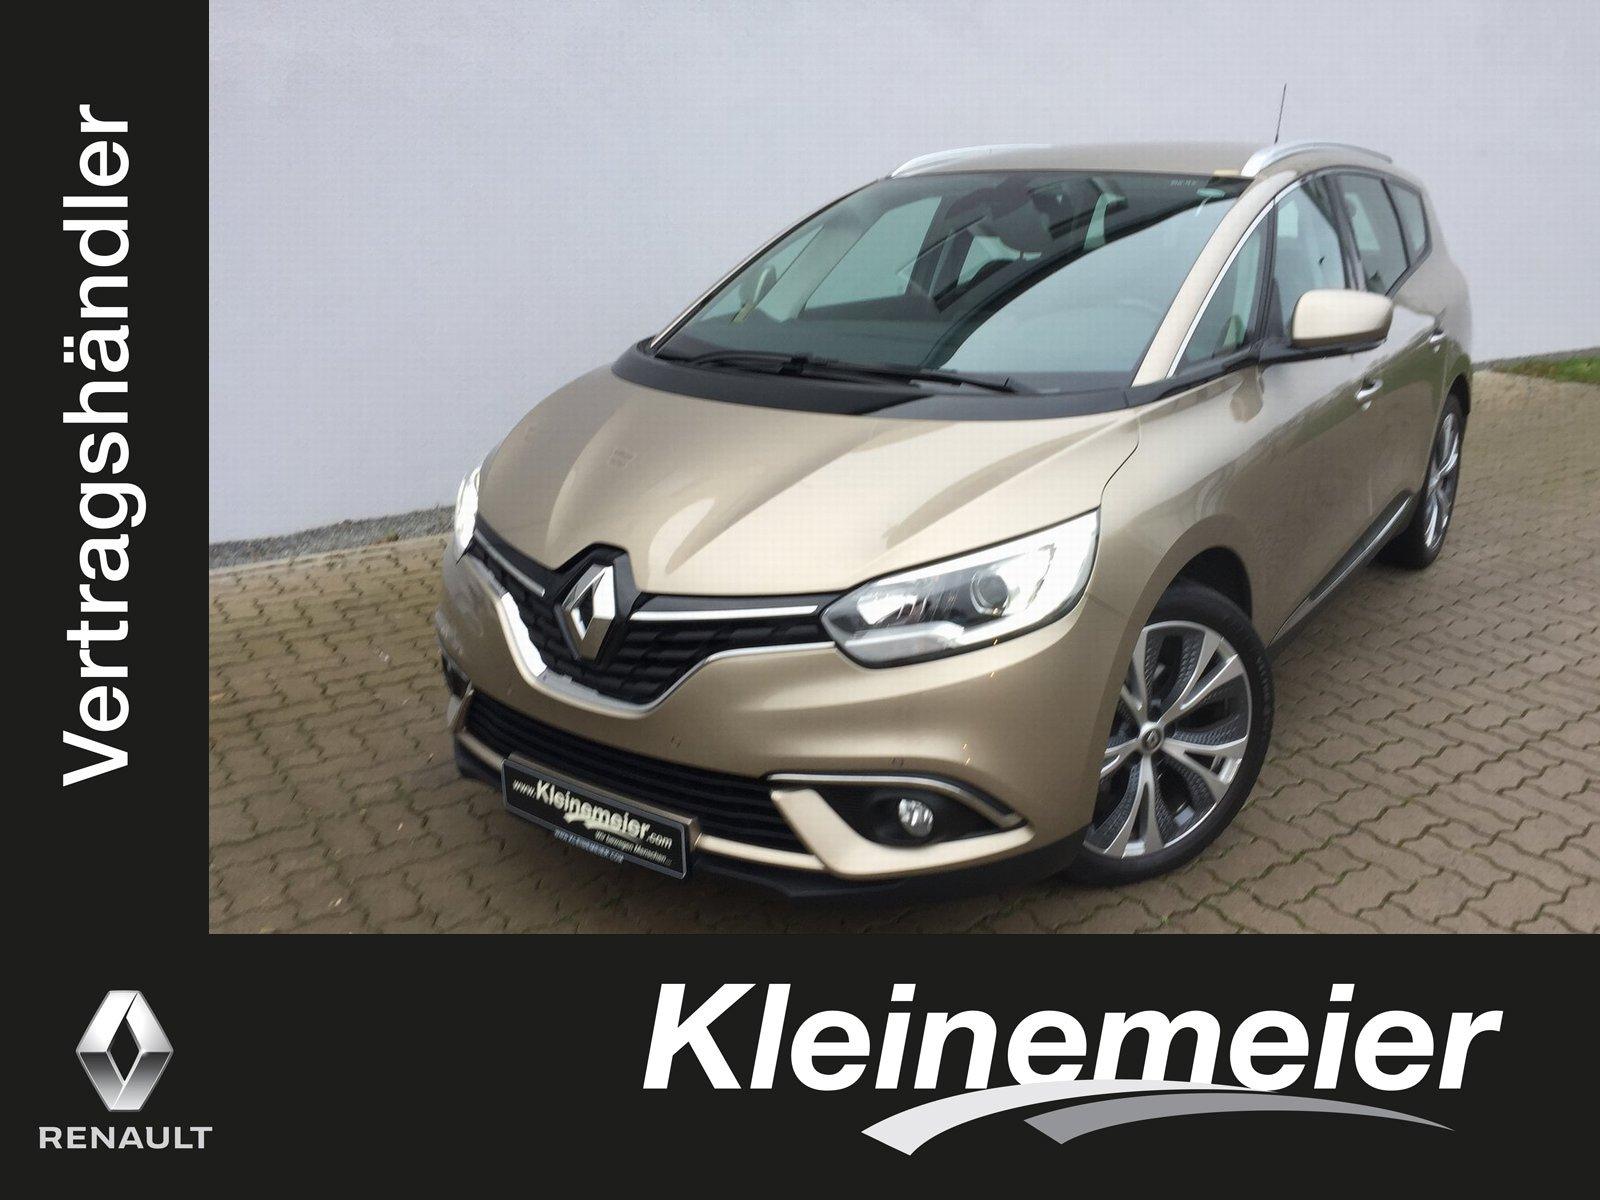 Renault Grand Scenic IV 1.2 TCe 115 Energy Intens*Navi*, Jahr 2017, Benzin